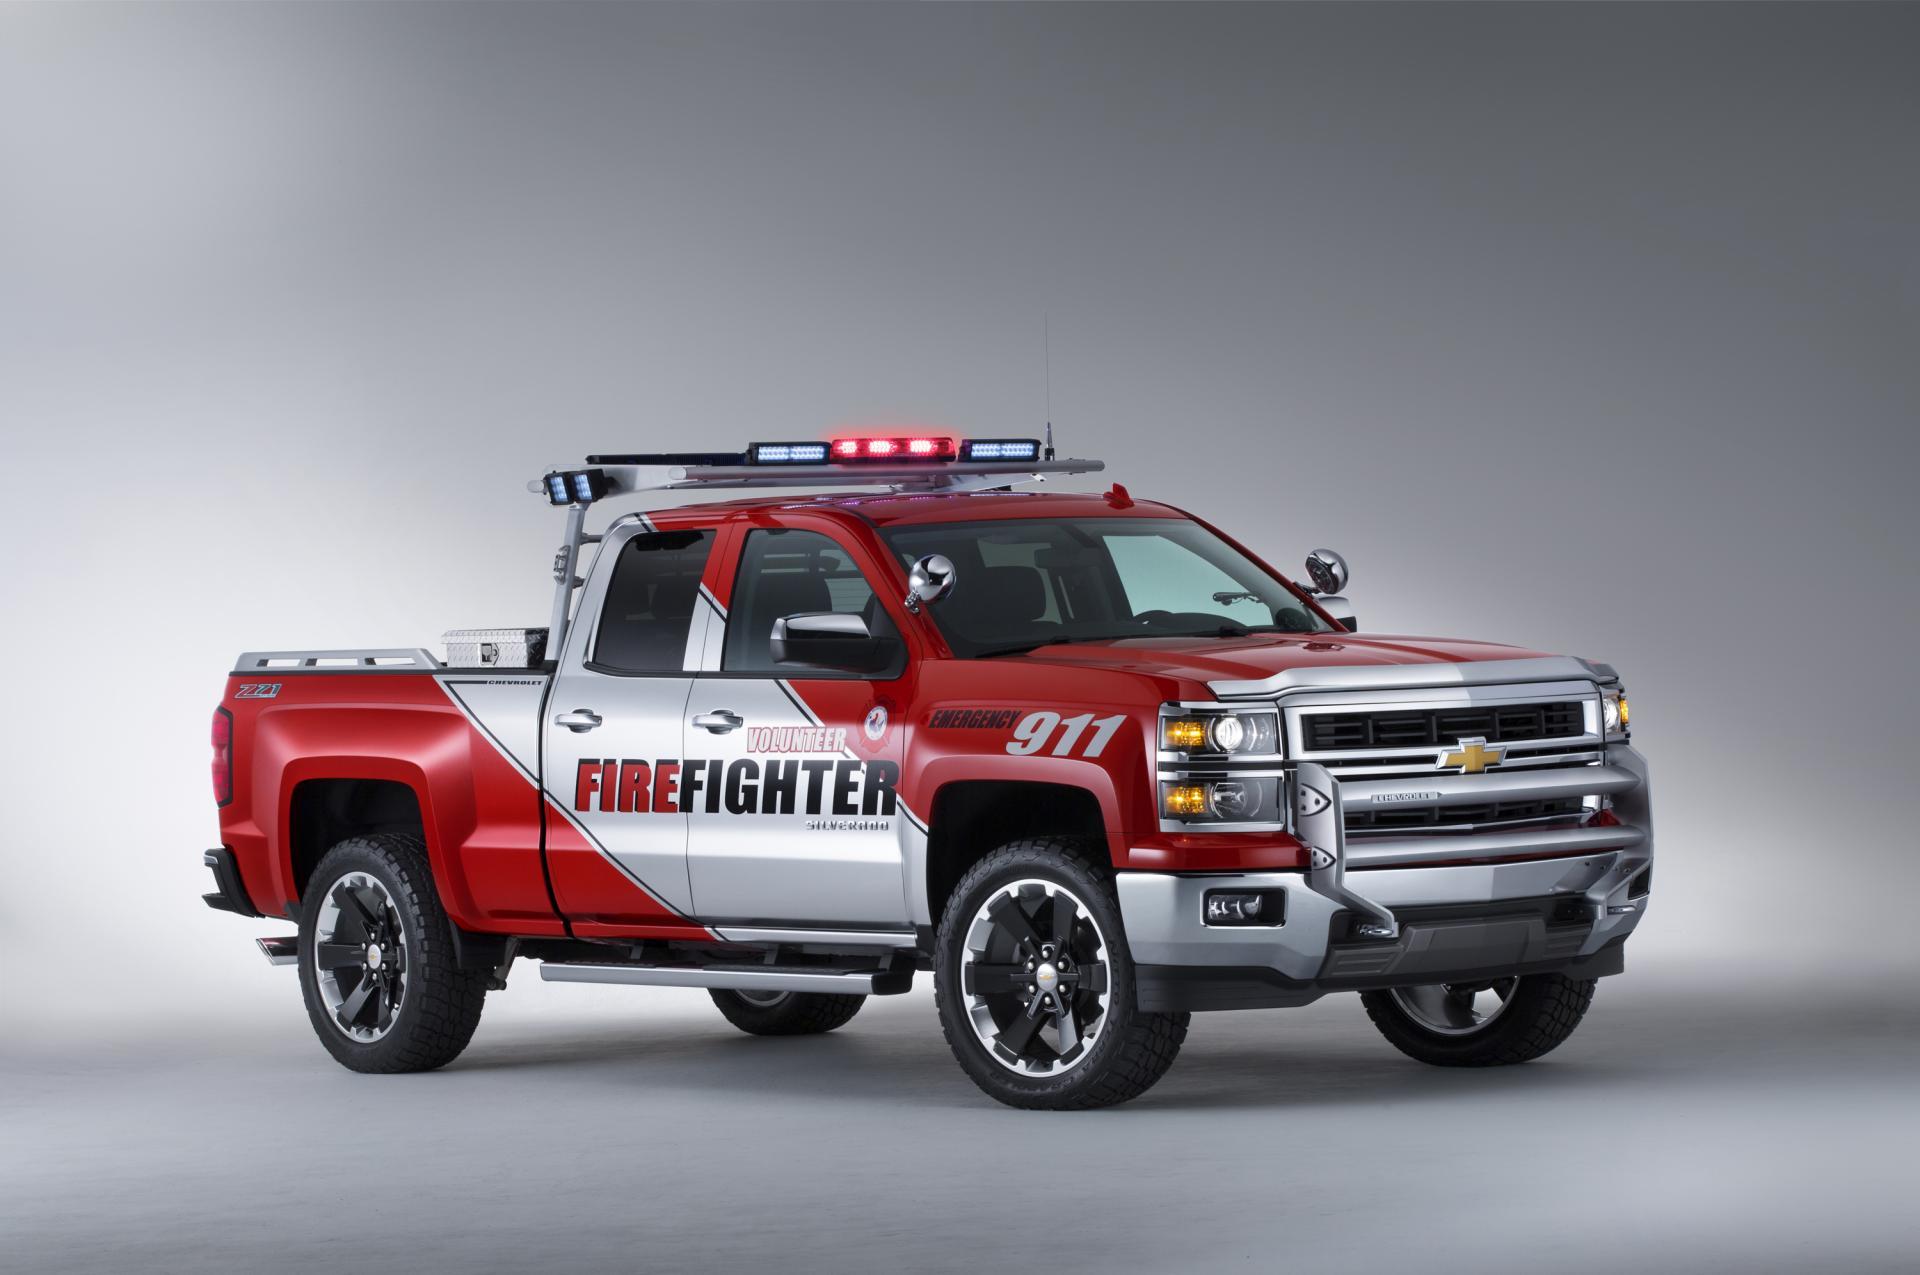 2016 Ram 1500 >> 2014 Chevrolet Silverado Volunteer Firefighter Concept - conceptcarz.com